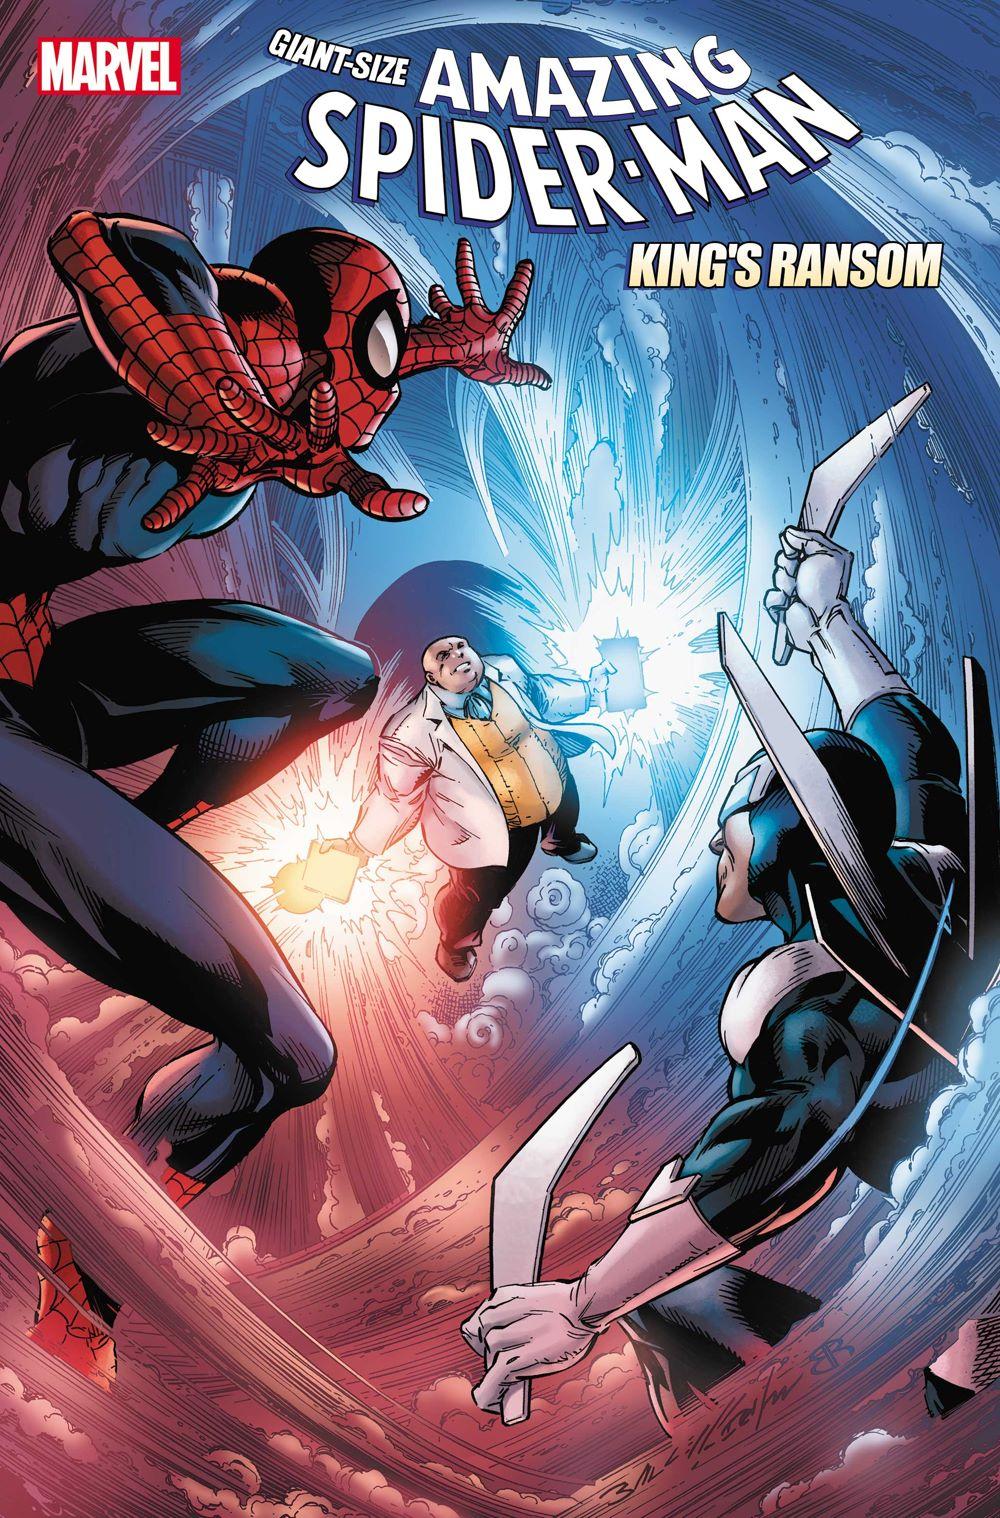 GSASMKINGR2021001_Cover GIANT-SIZE SPIDER-MAN: KING'S RANSOM #1 reveals the Kingpin's plans